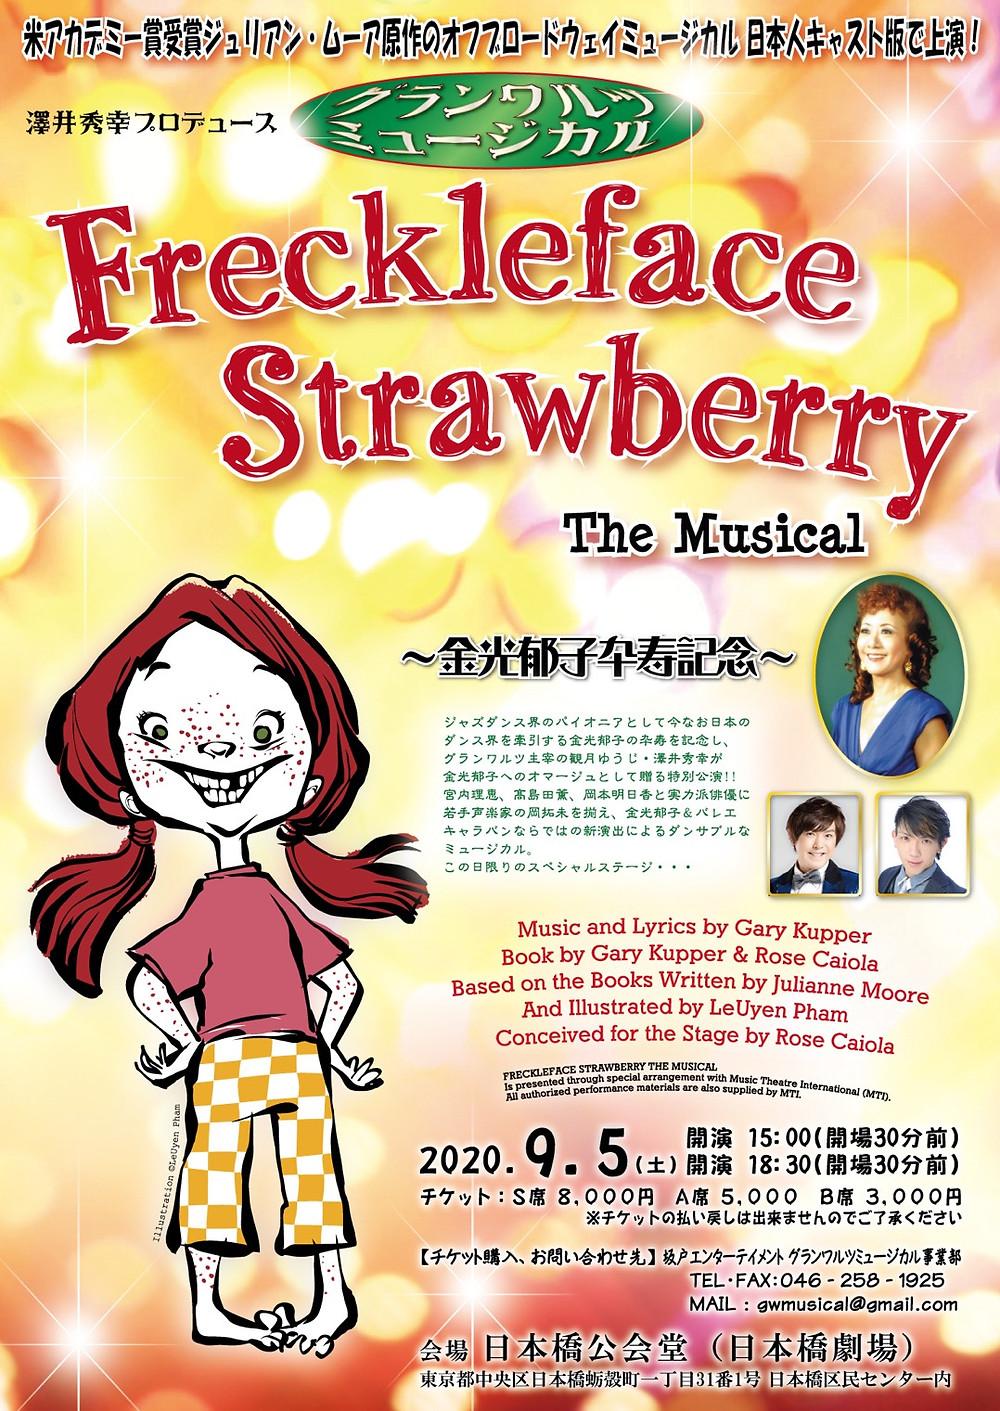 金光郁子卆寿記念「Freckleface Strawberry」 2020年9月5日 日本橋公会堂(日本橋劇場)にて